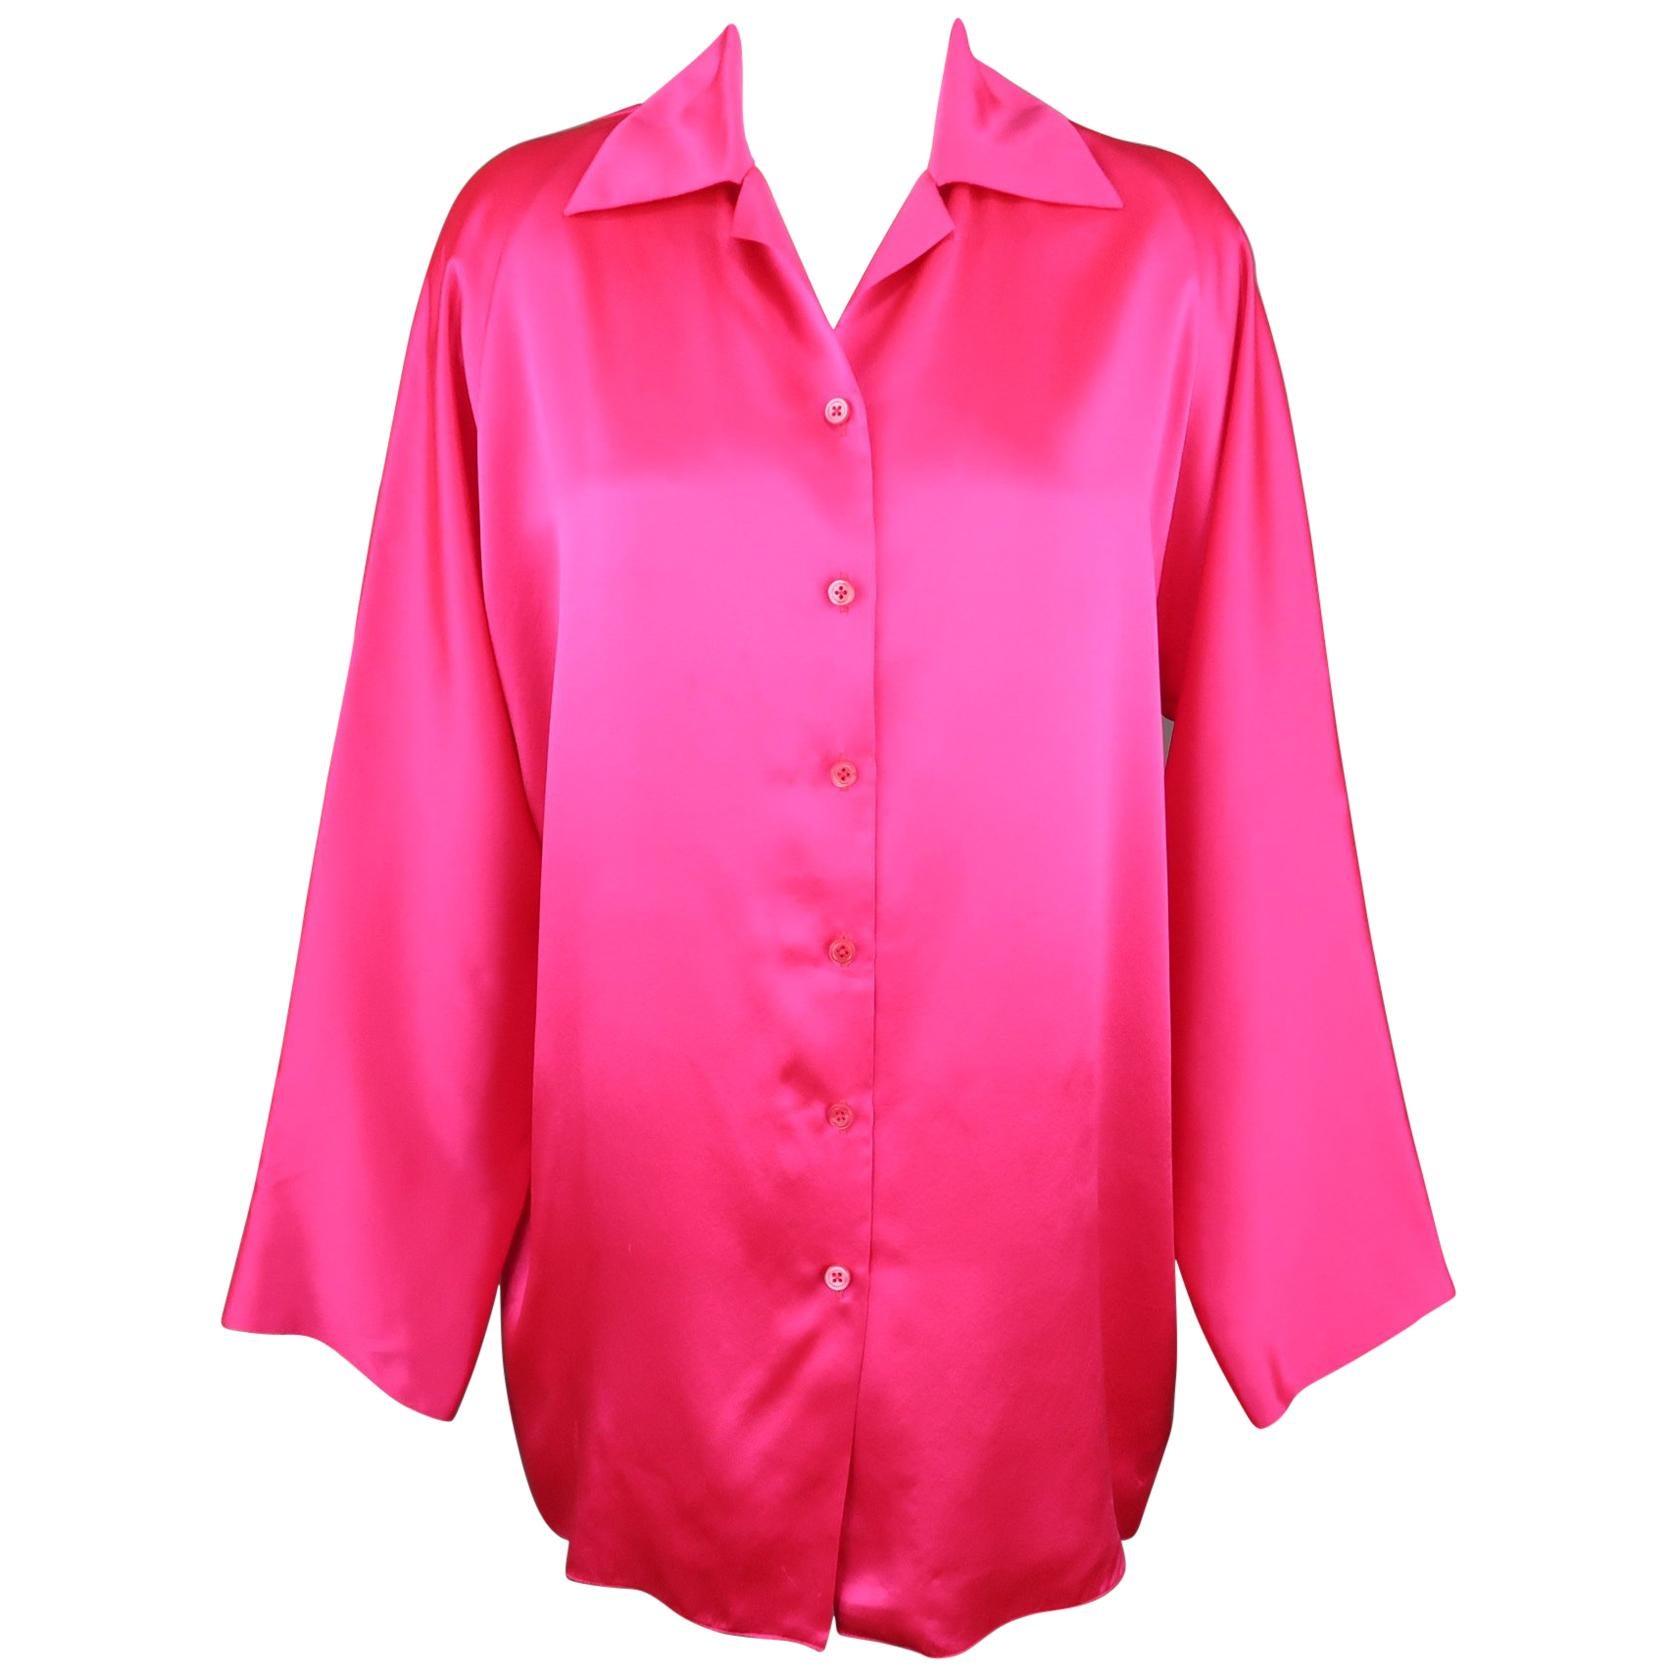 SHAMASK Size S Fuchsia Pink Silk Oversized Collared Blouse